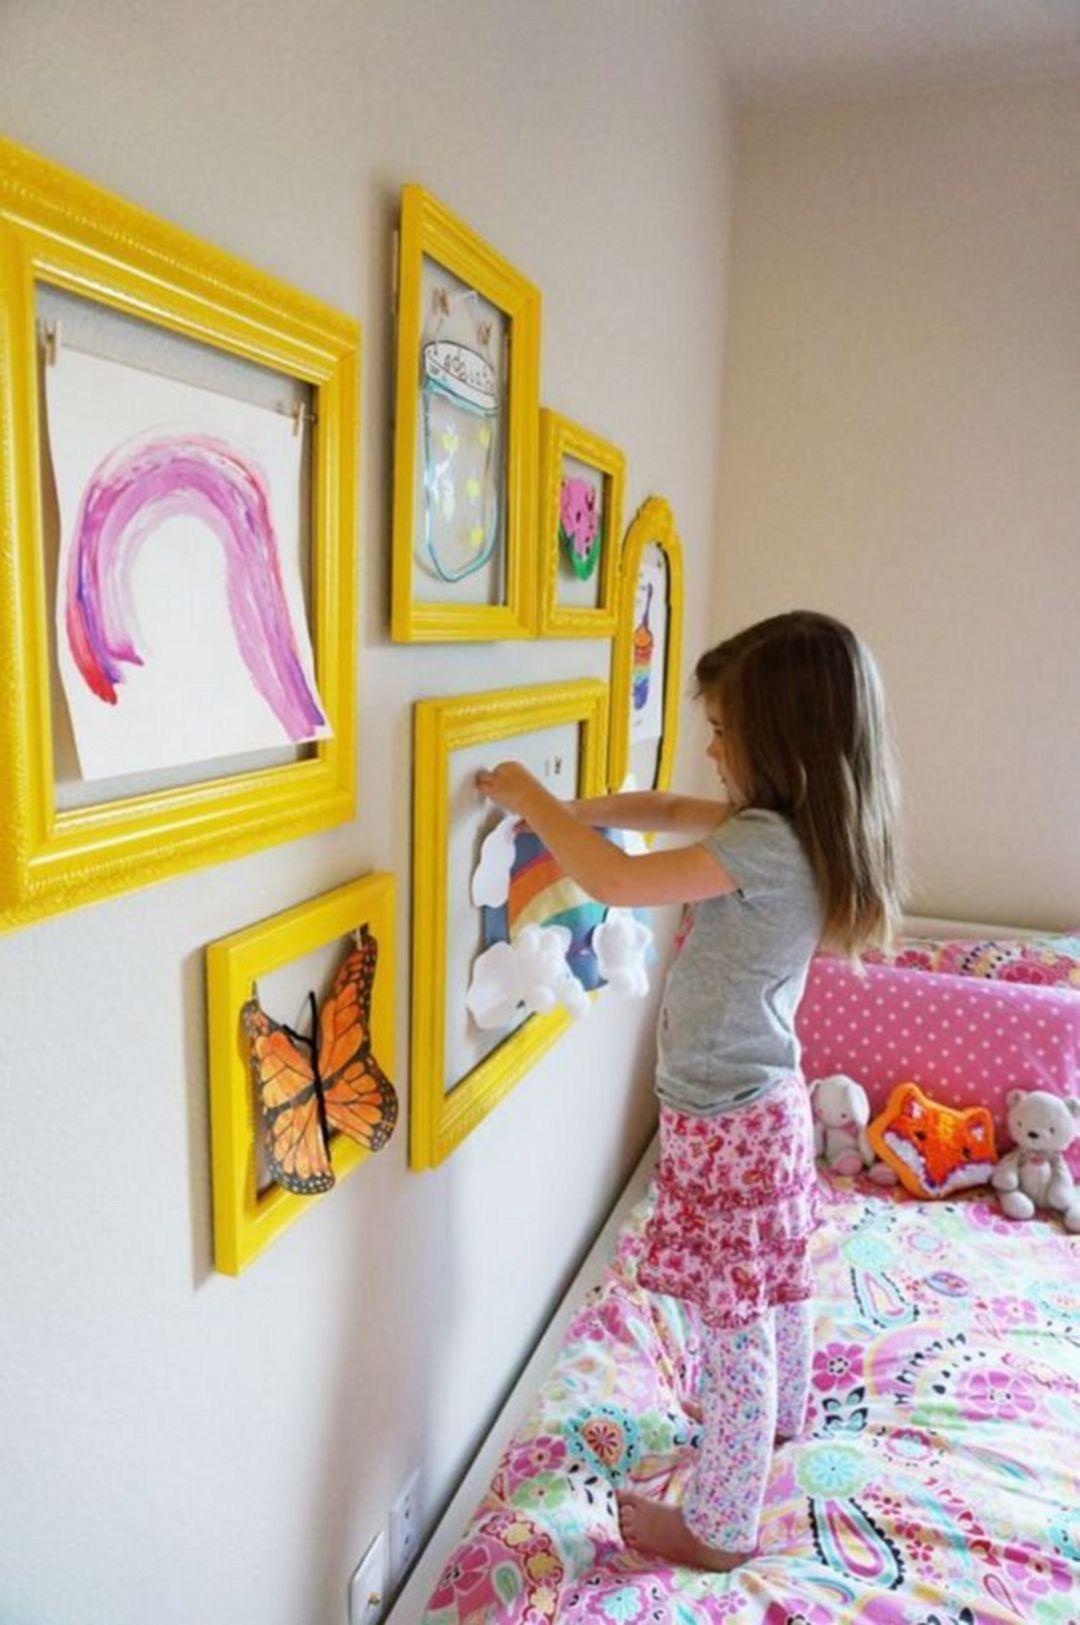 Simple And Elegant Toy Storage Ideas: 49 Best Ideas | Toy storage ...